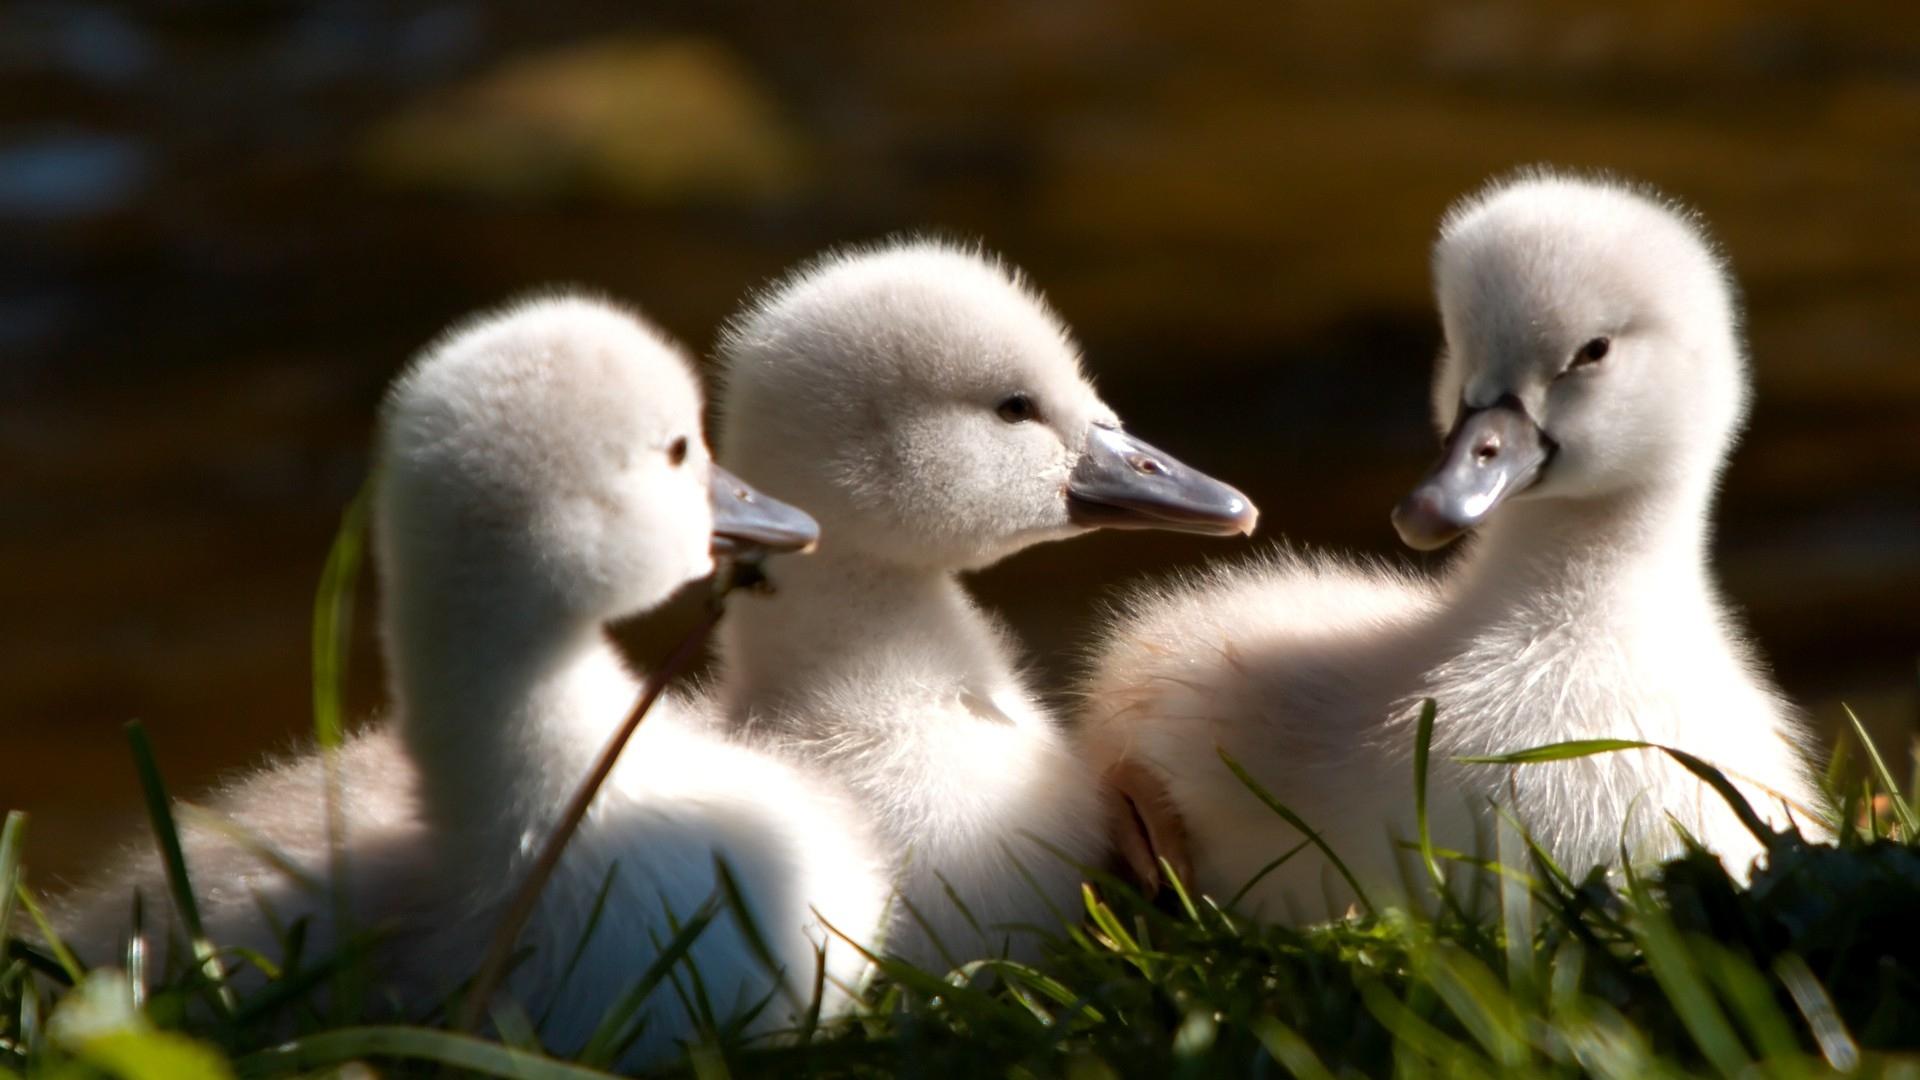 Download Wallpaper 1920x1080 ducks, flock, kids, beak, furry Full HD ...